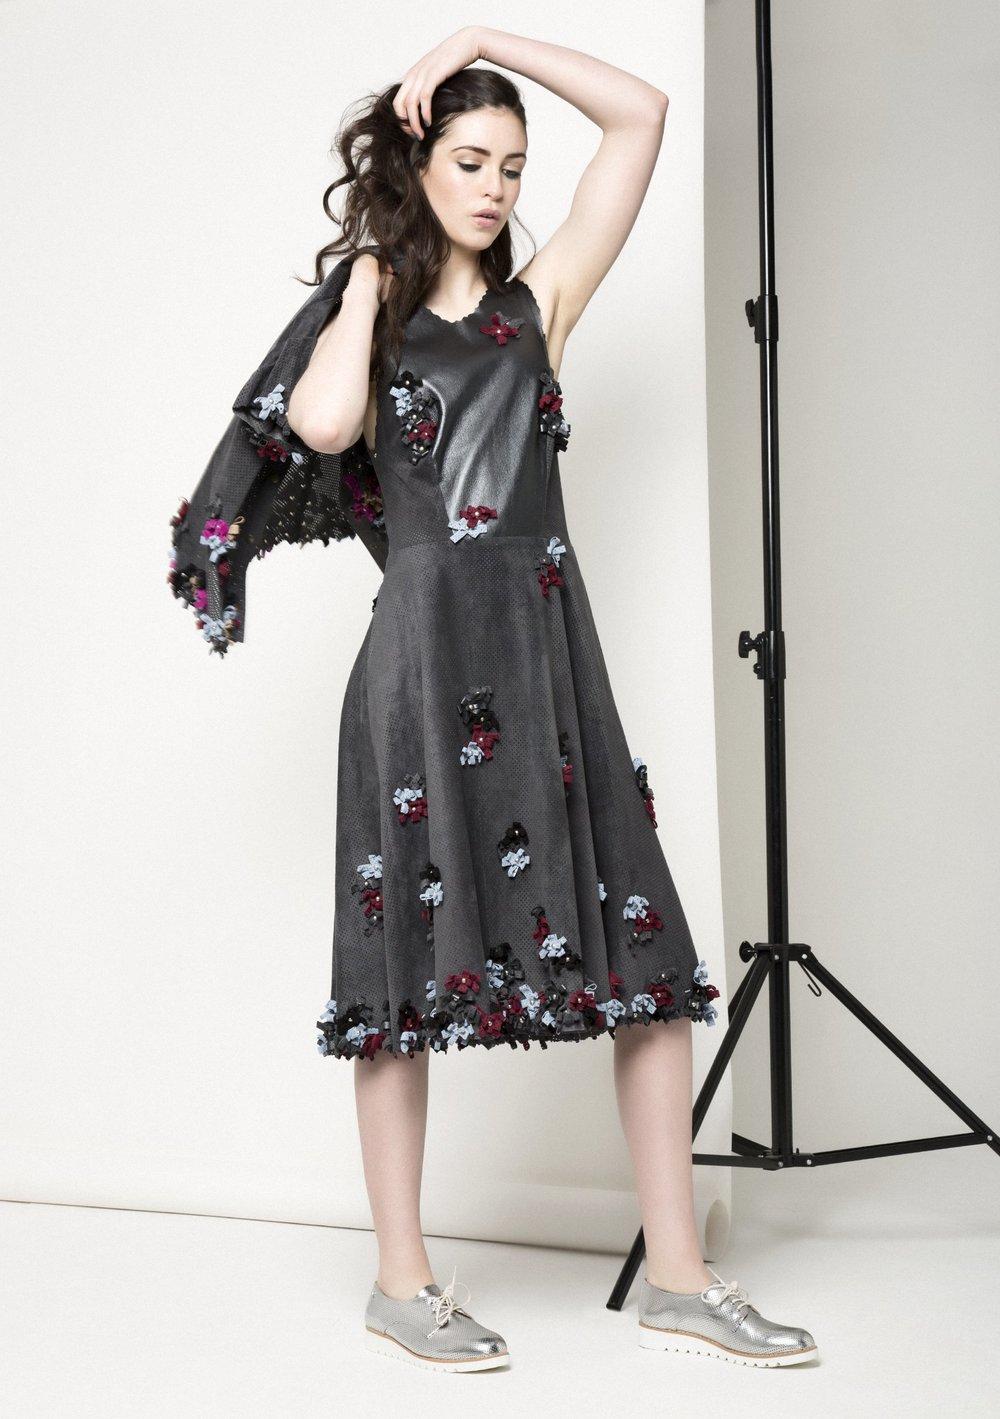 Manley AW15 Carly Bow Dress €783, Maya Bow Jacket €486.jpg